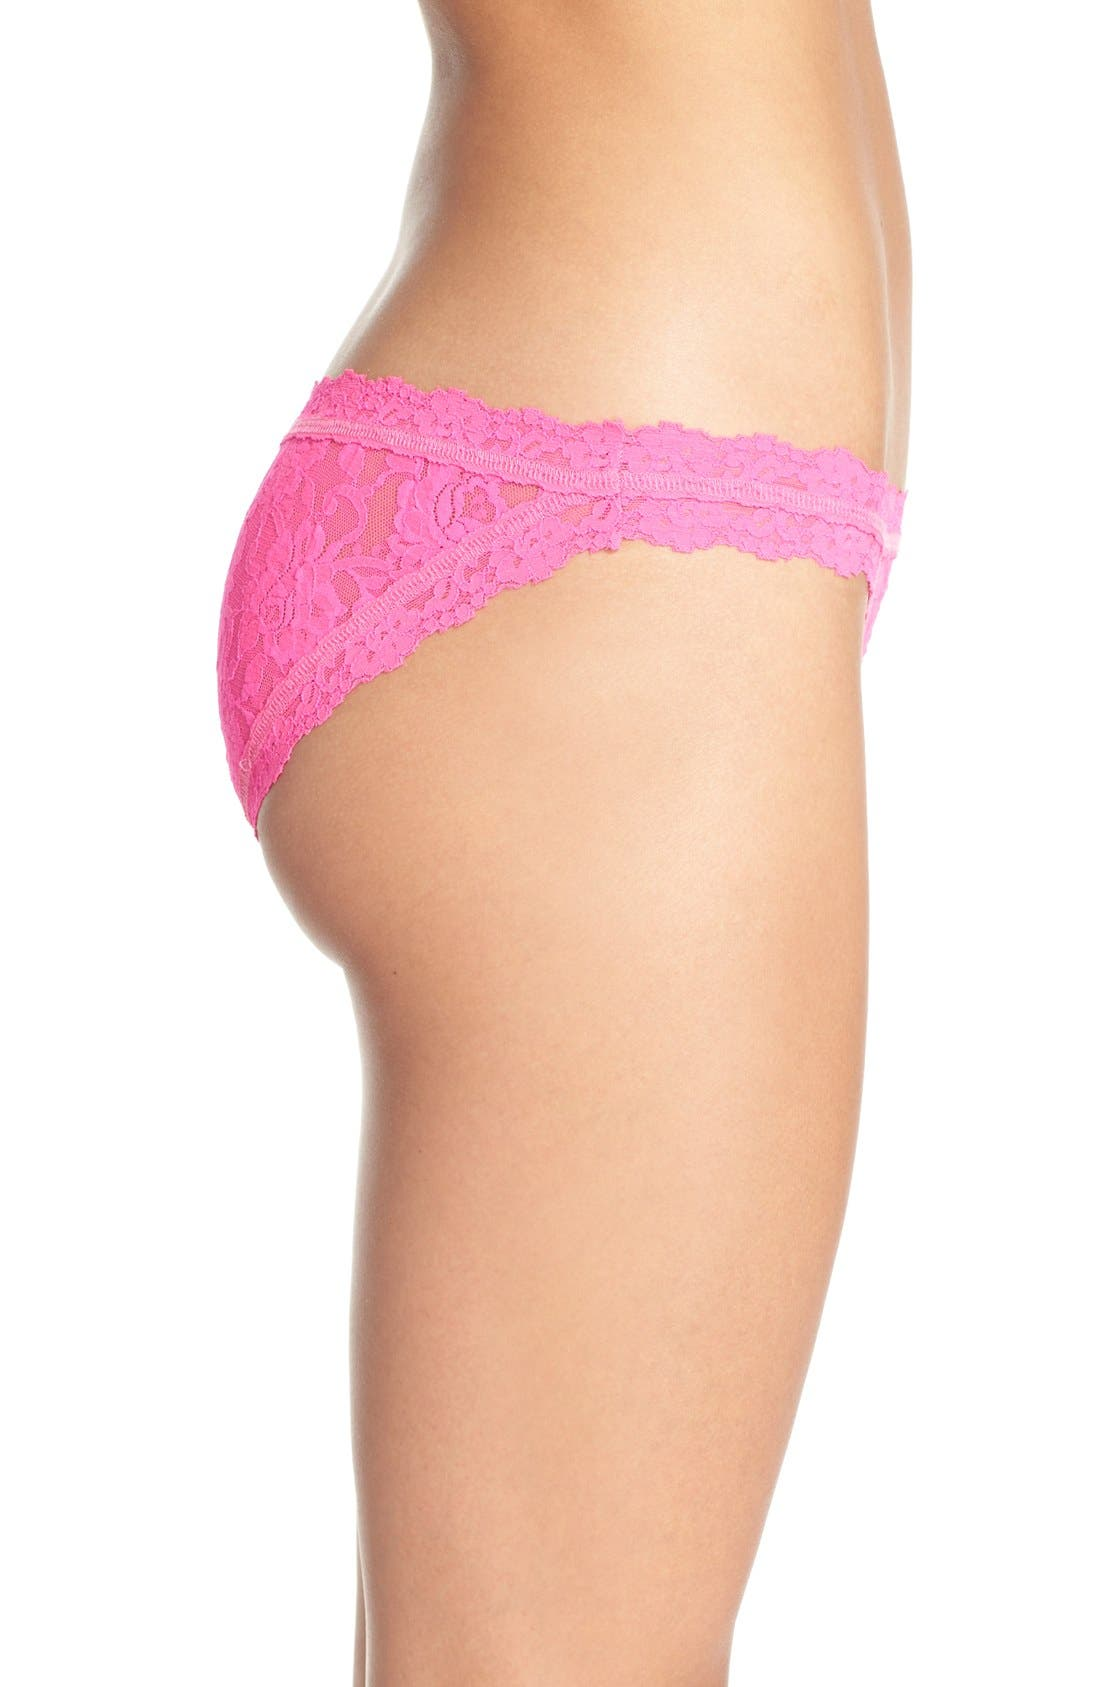 'Signature Lace' Brazilian Bikini,                             Alternate thumbnail 116, color,